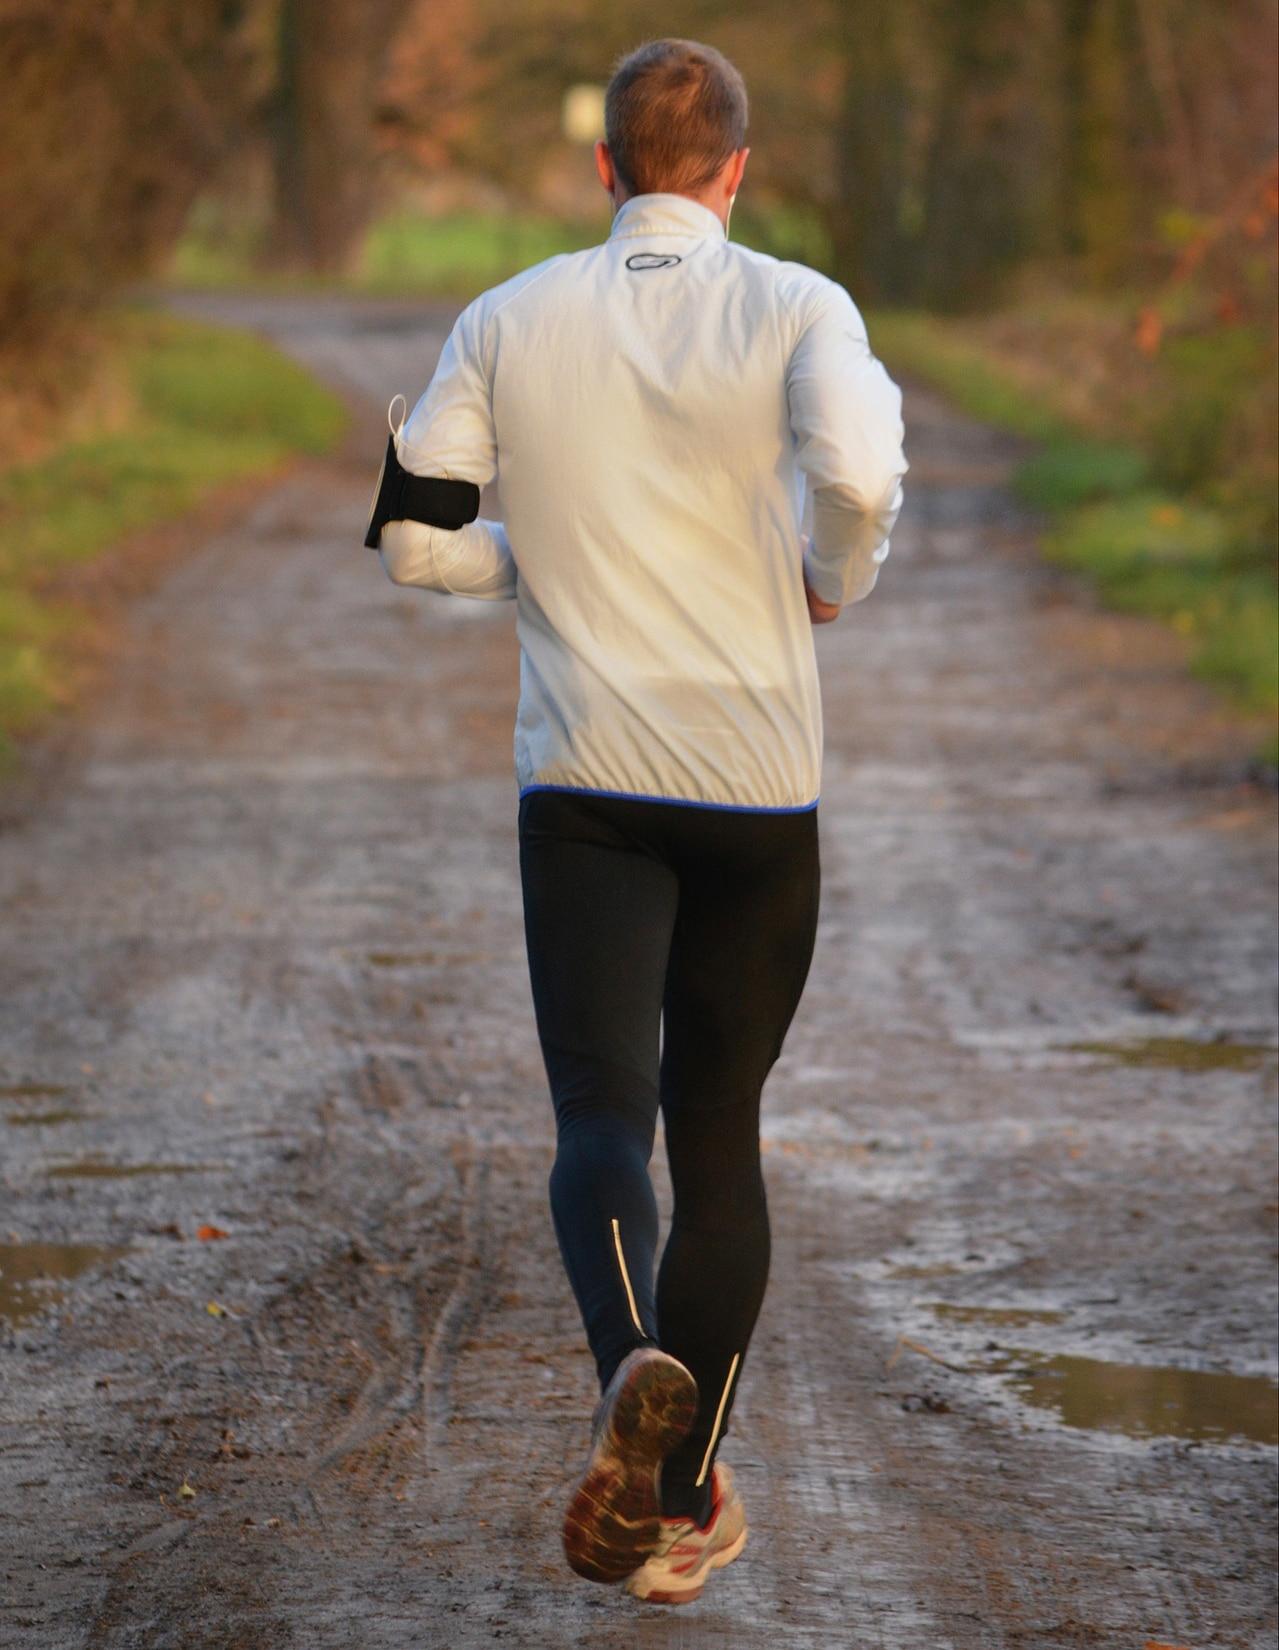 lancashire runner